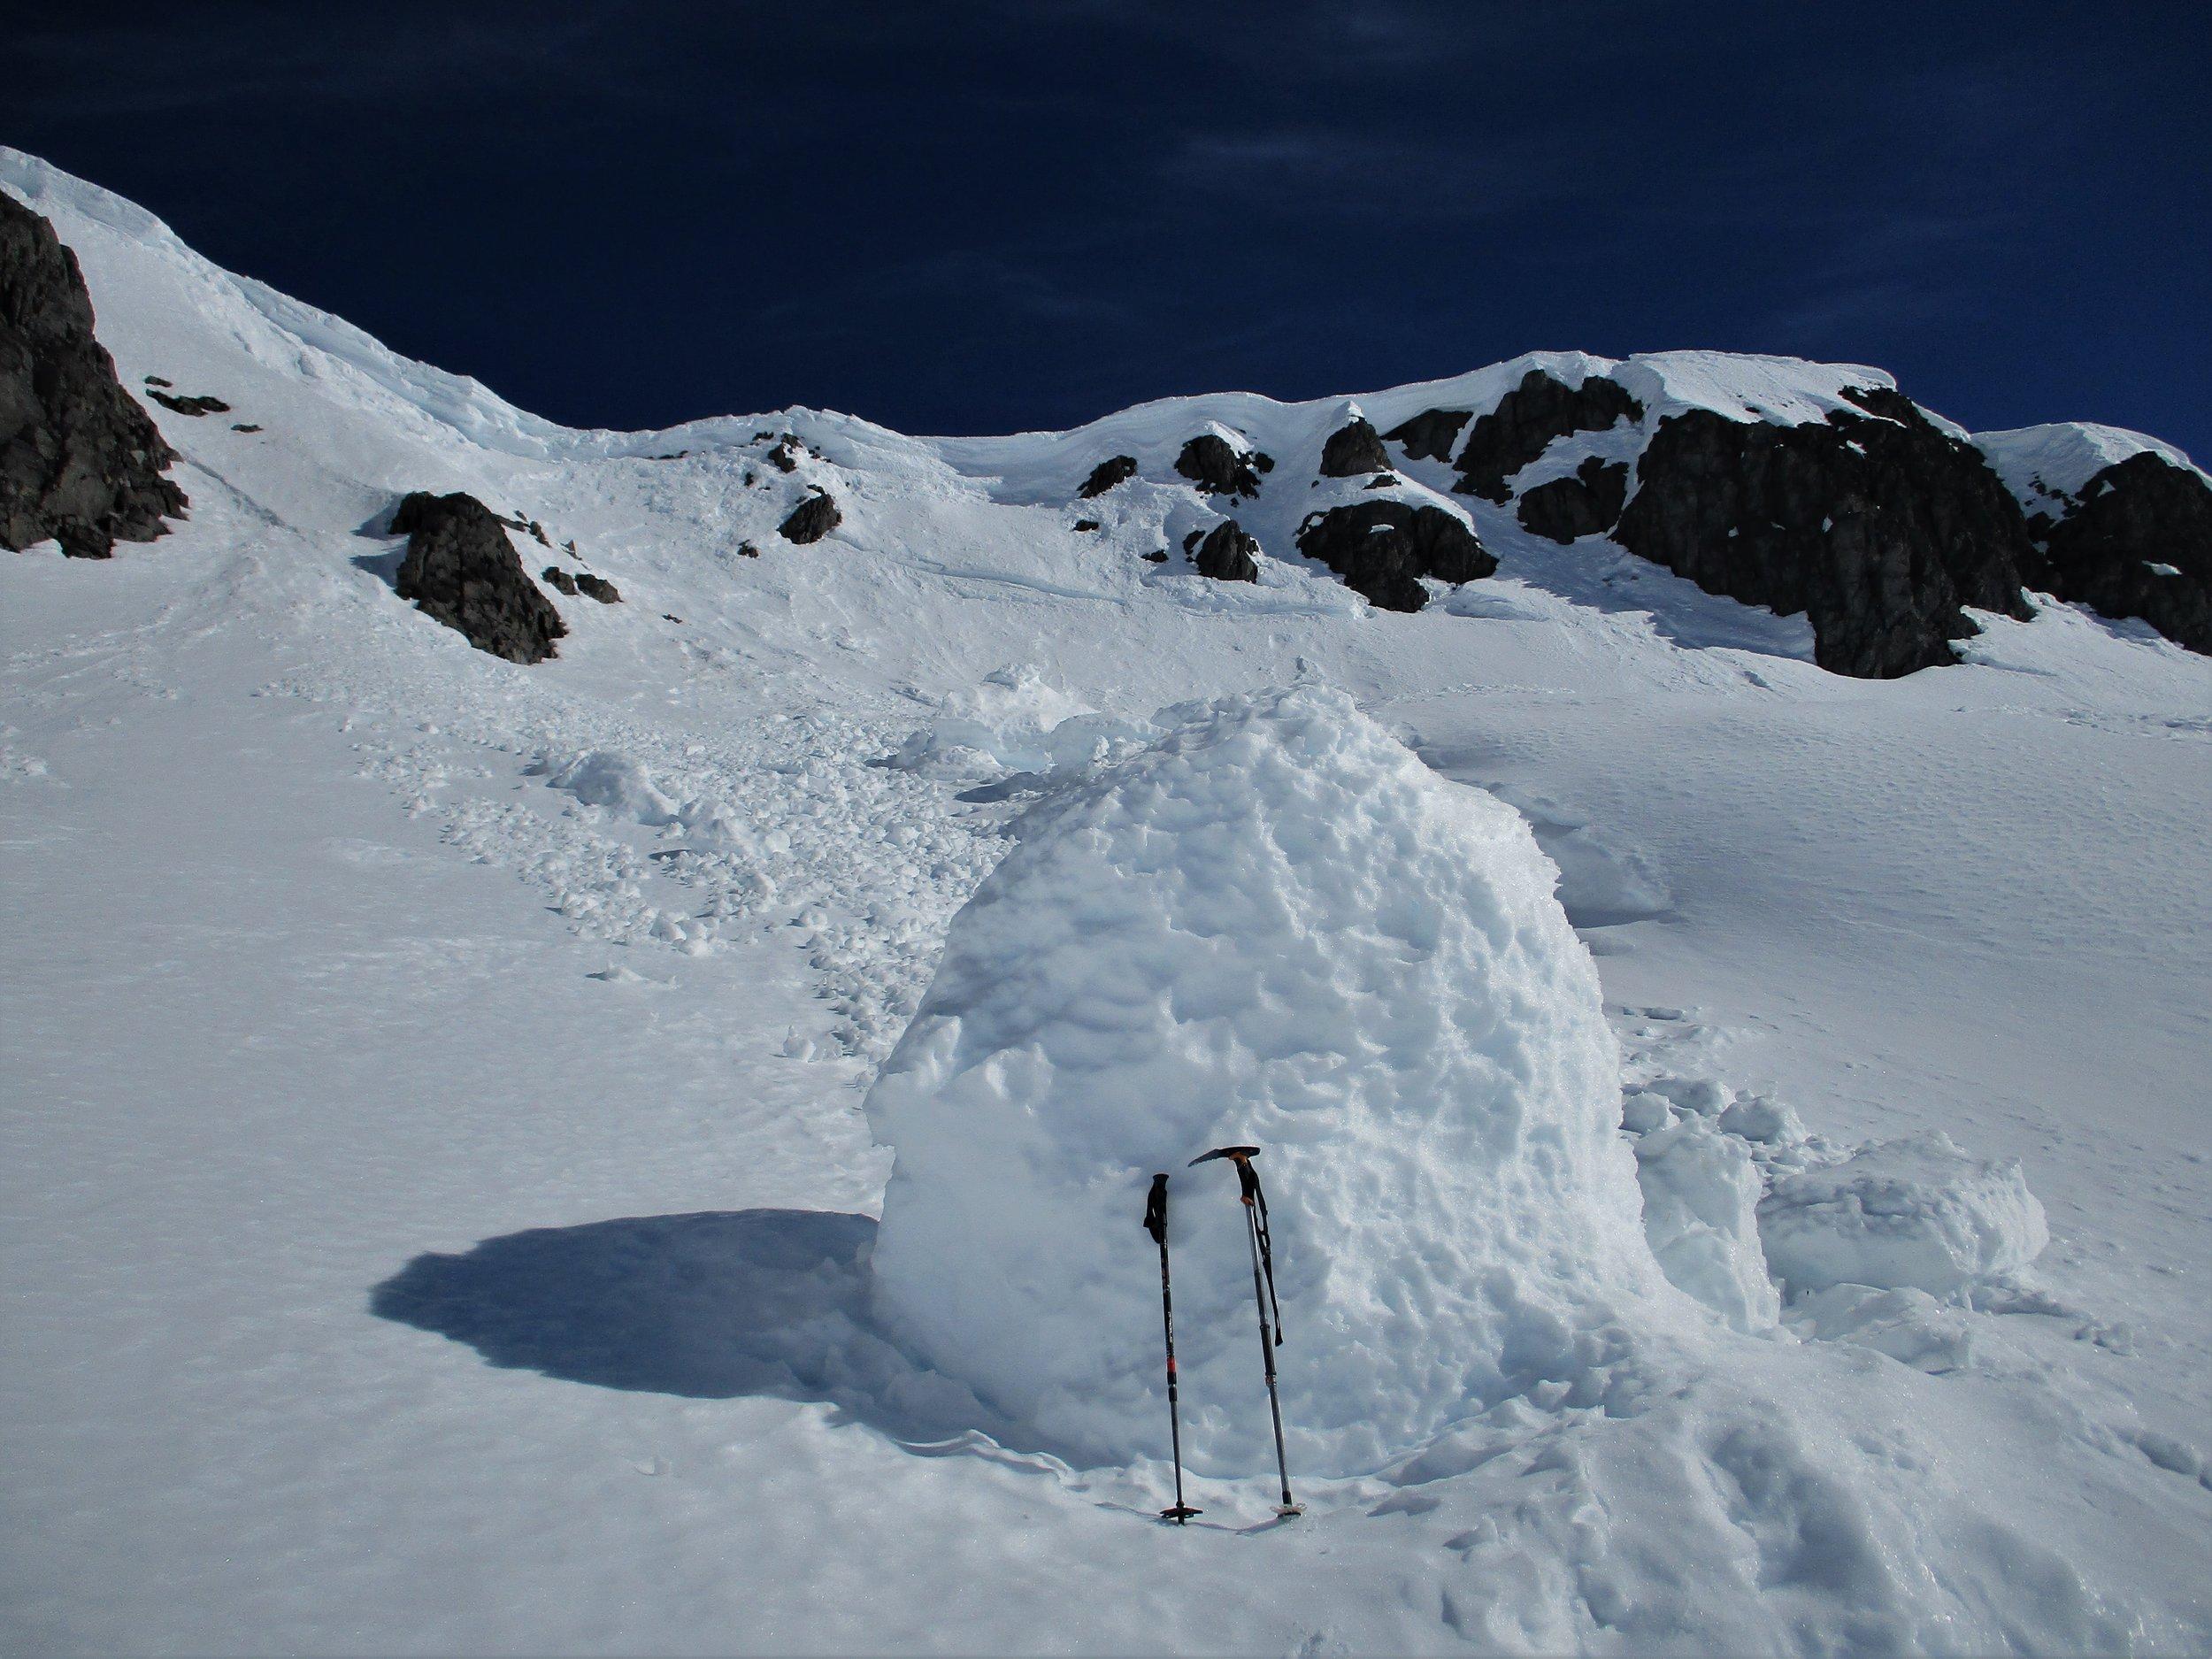 Large avalanche blocks just lying around